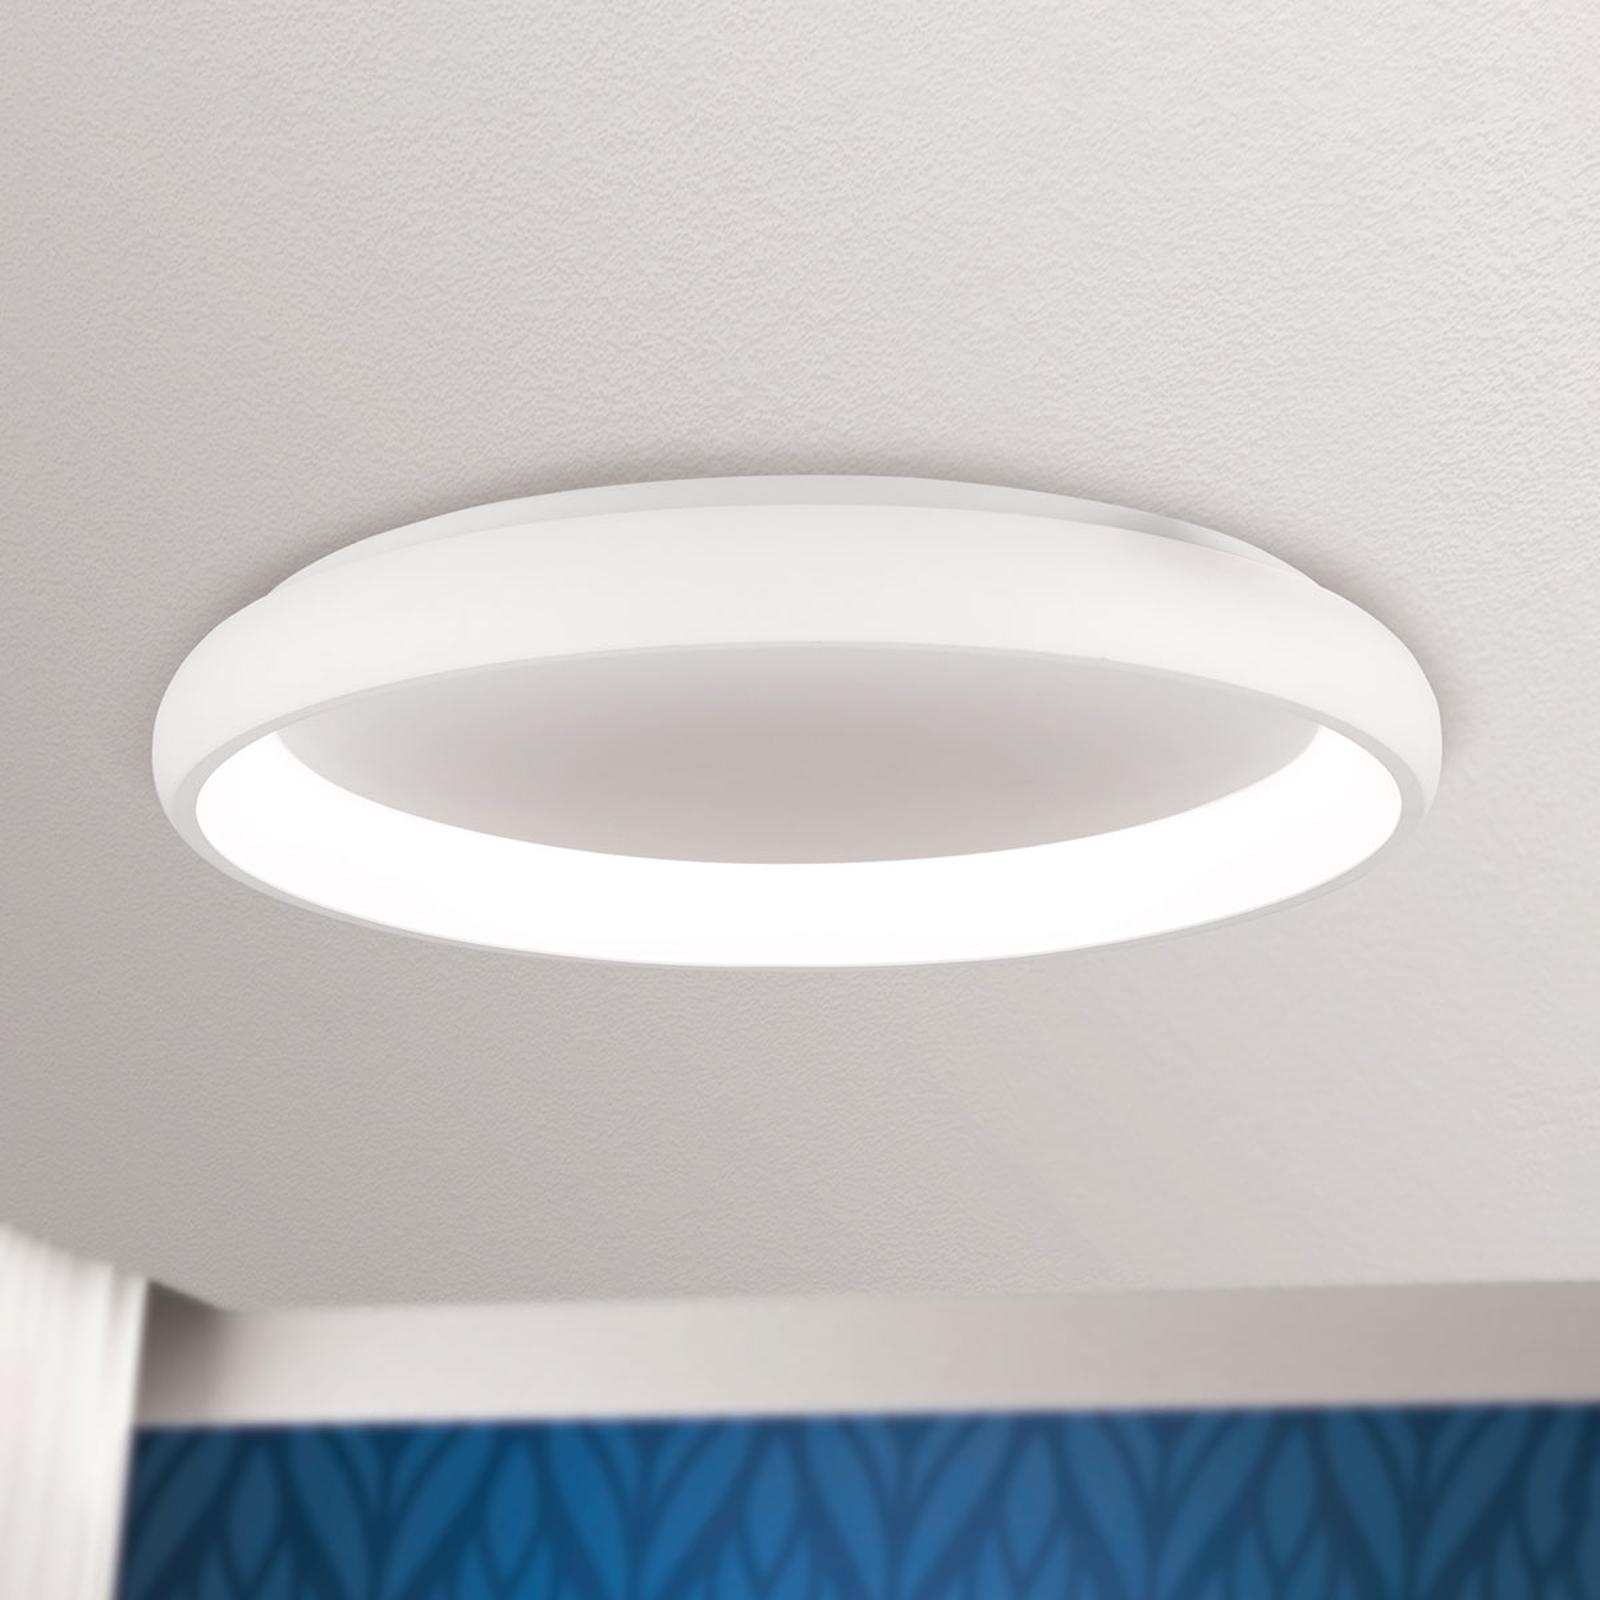 LED plafondlamp Venur m lichtuitstr binnenin 61 cm